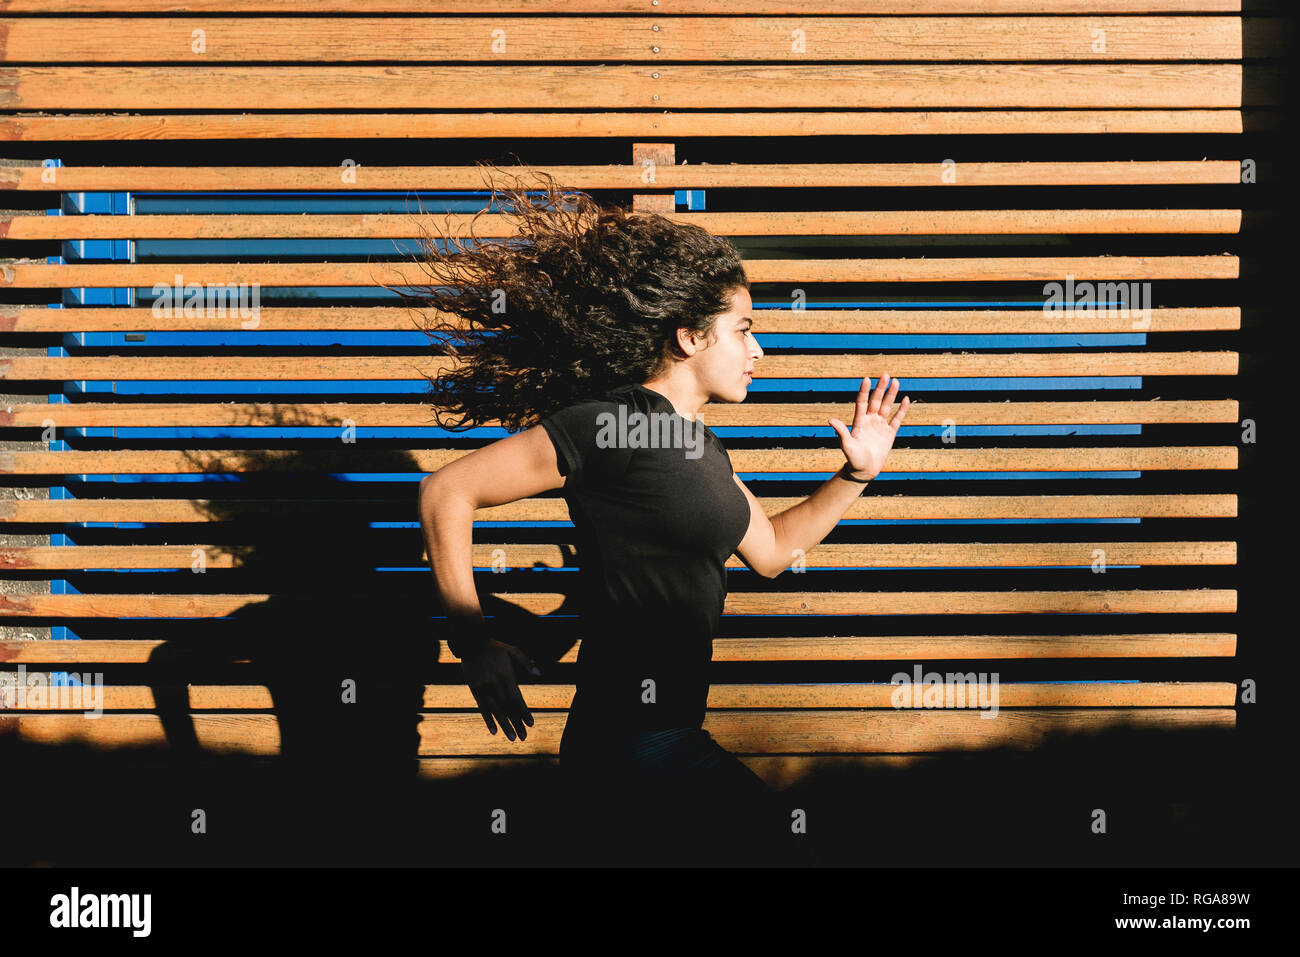 Sportive joven que corre a lo largo de paneles de madera Imagen De Stock